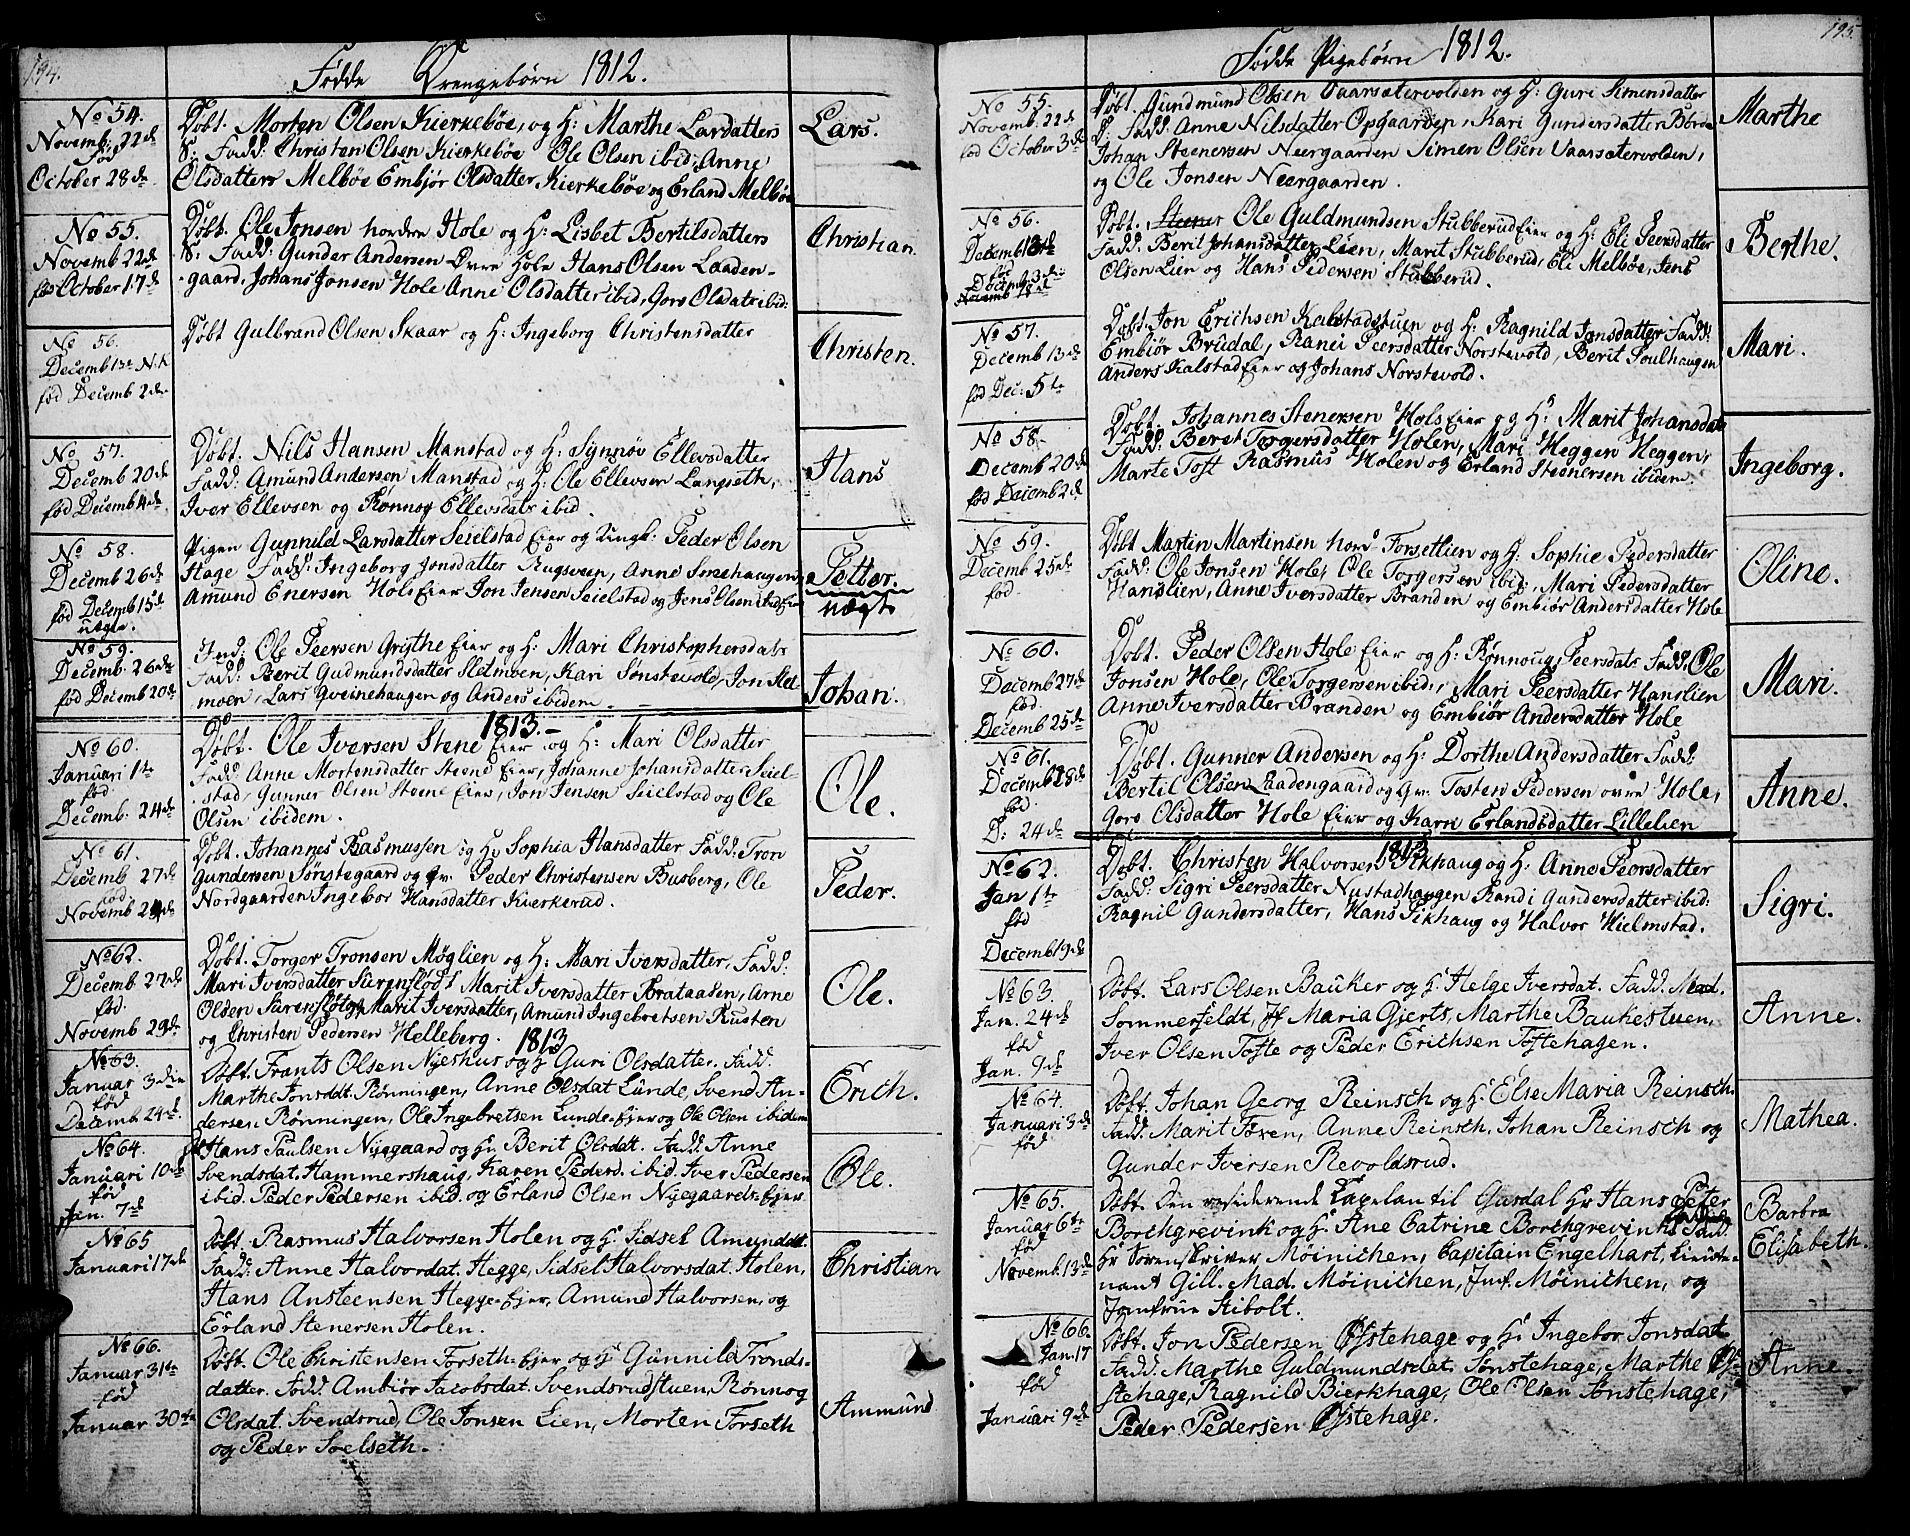 SAH, Gausdal prestekontor, Ministerialbok nr. 4, 1809-1817, s. 194-195